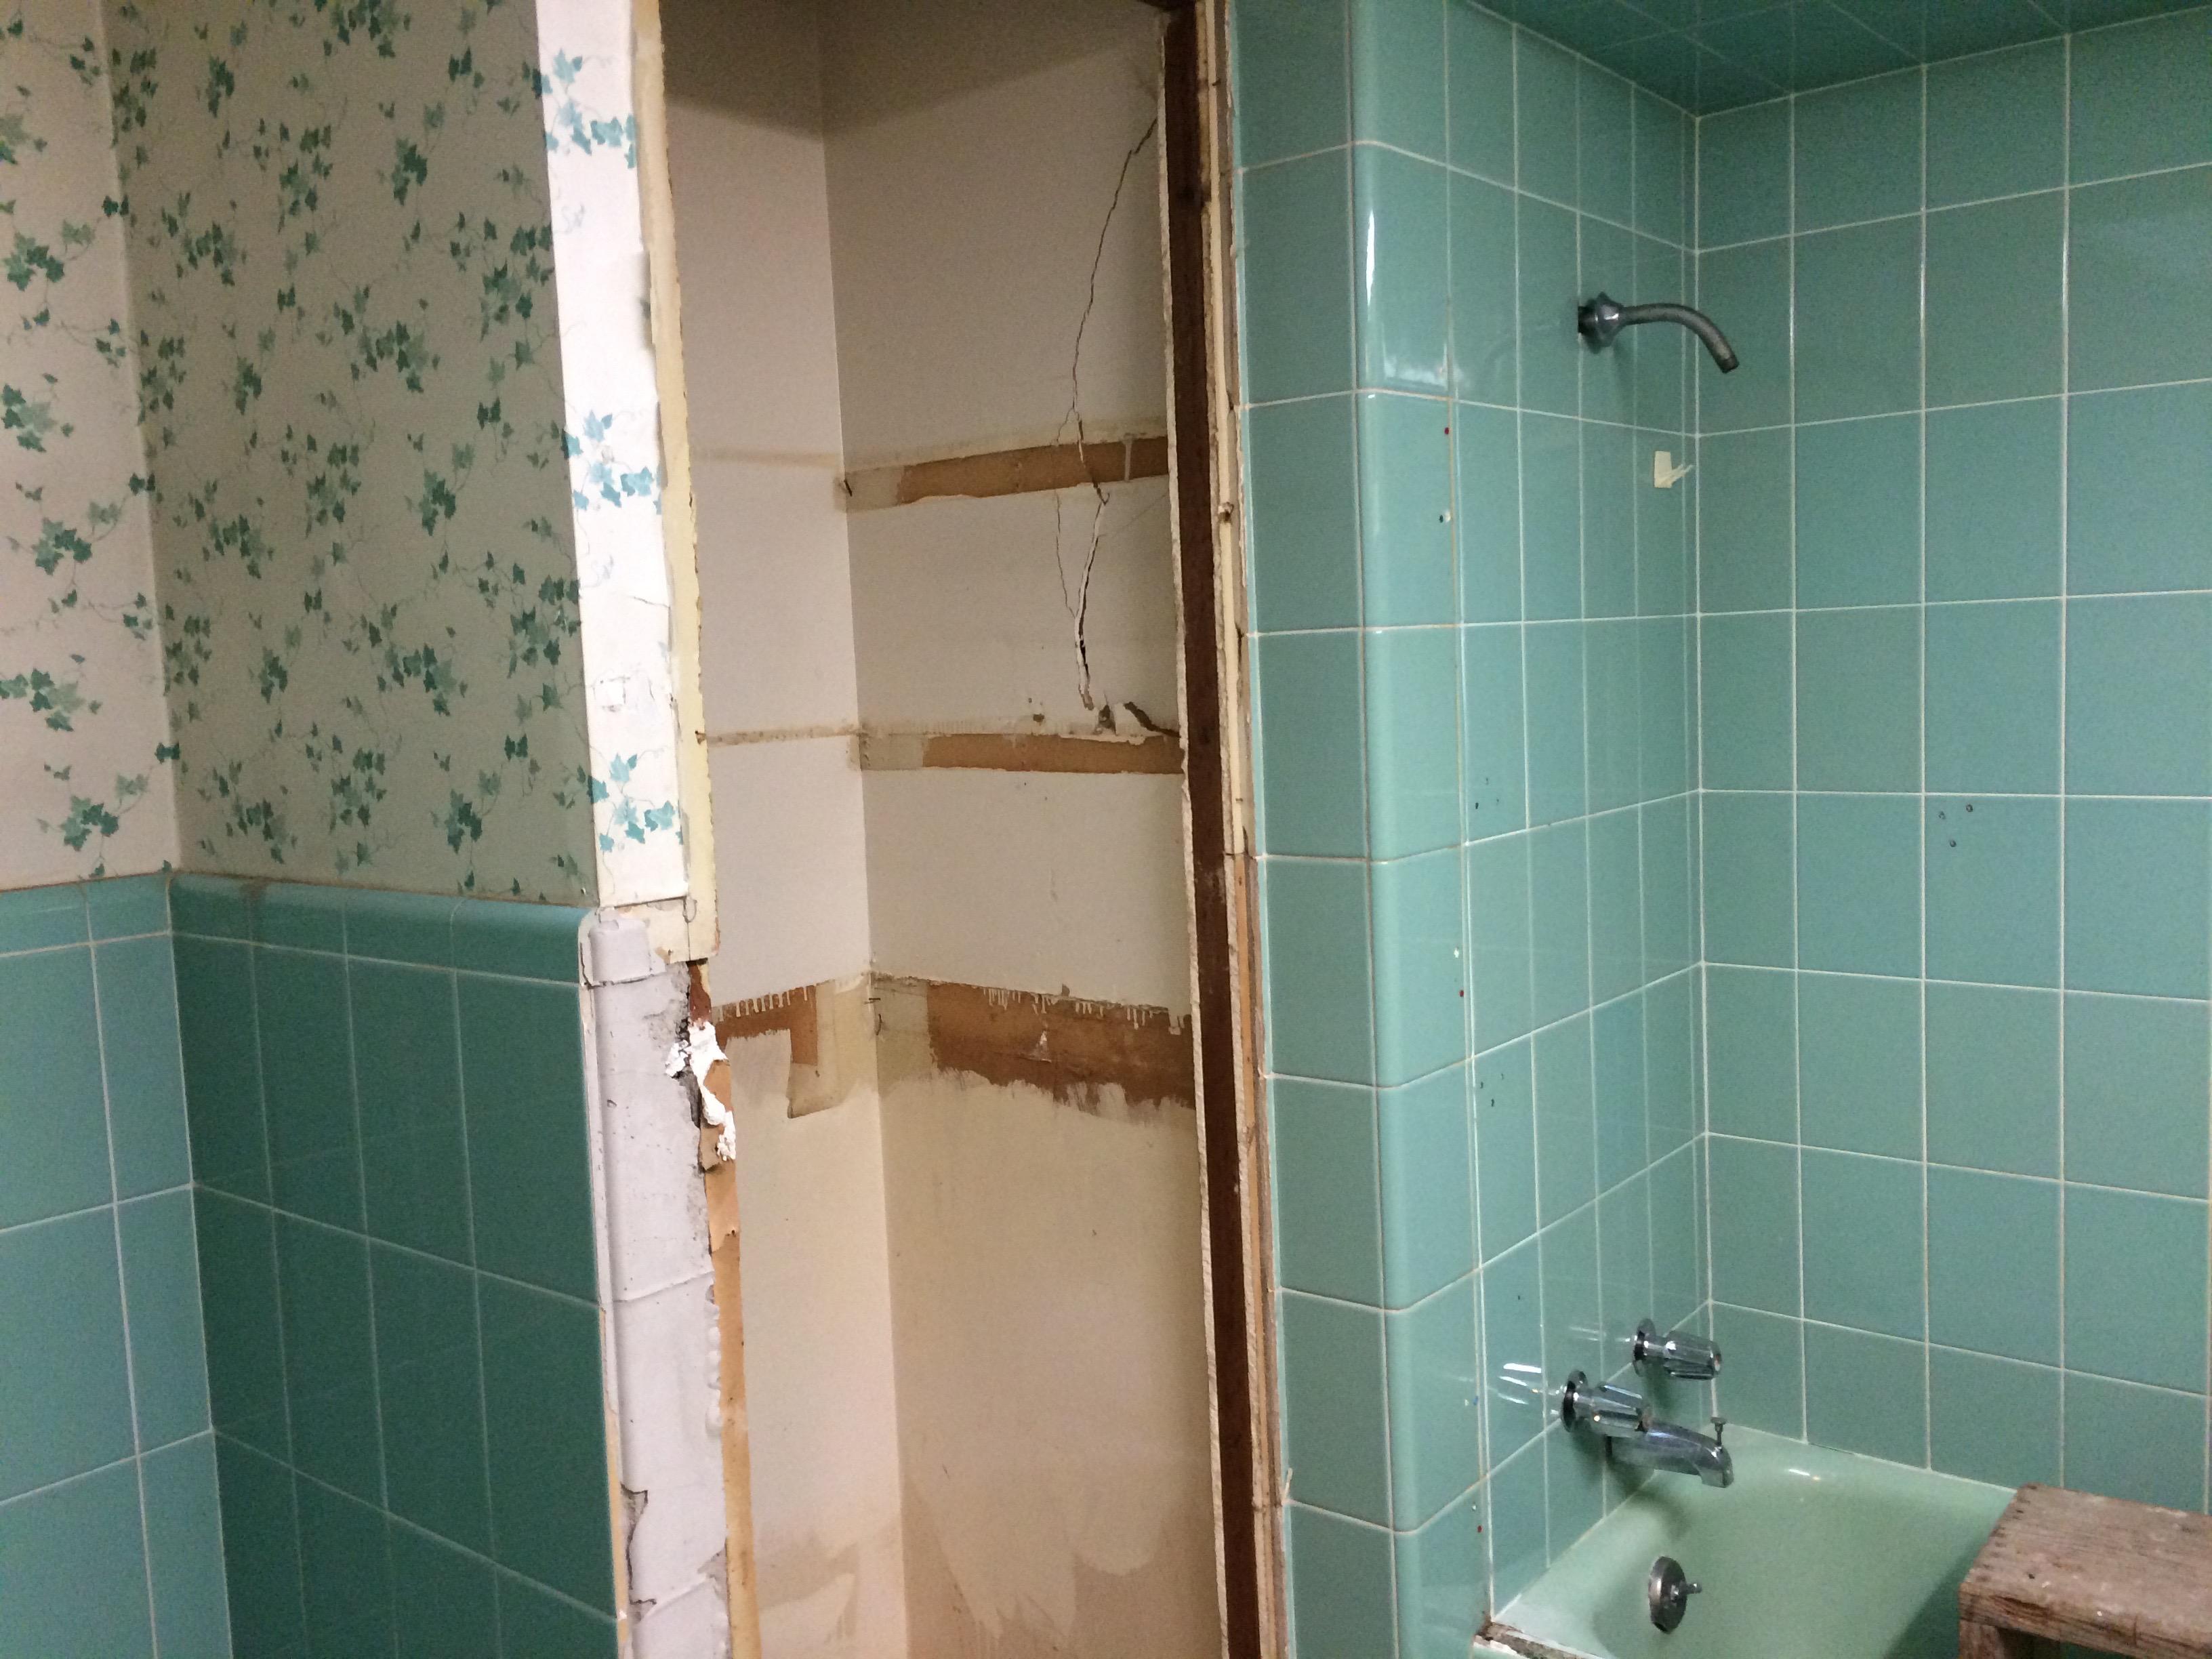 Rustic Circle master bathroom re-do: Oct \'16-Feb \'17 | Amy Martin